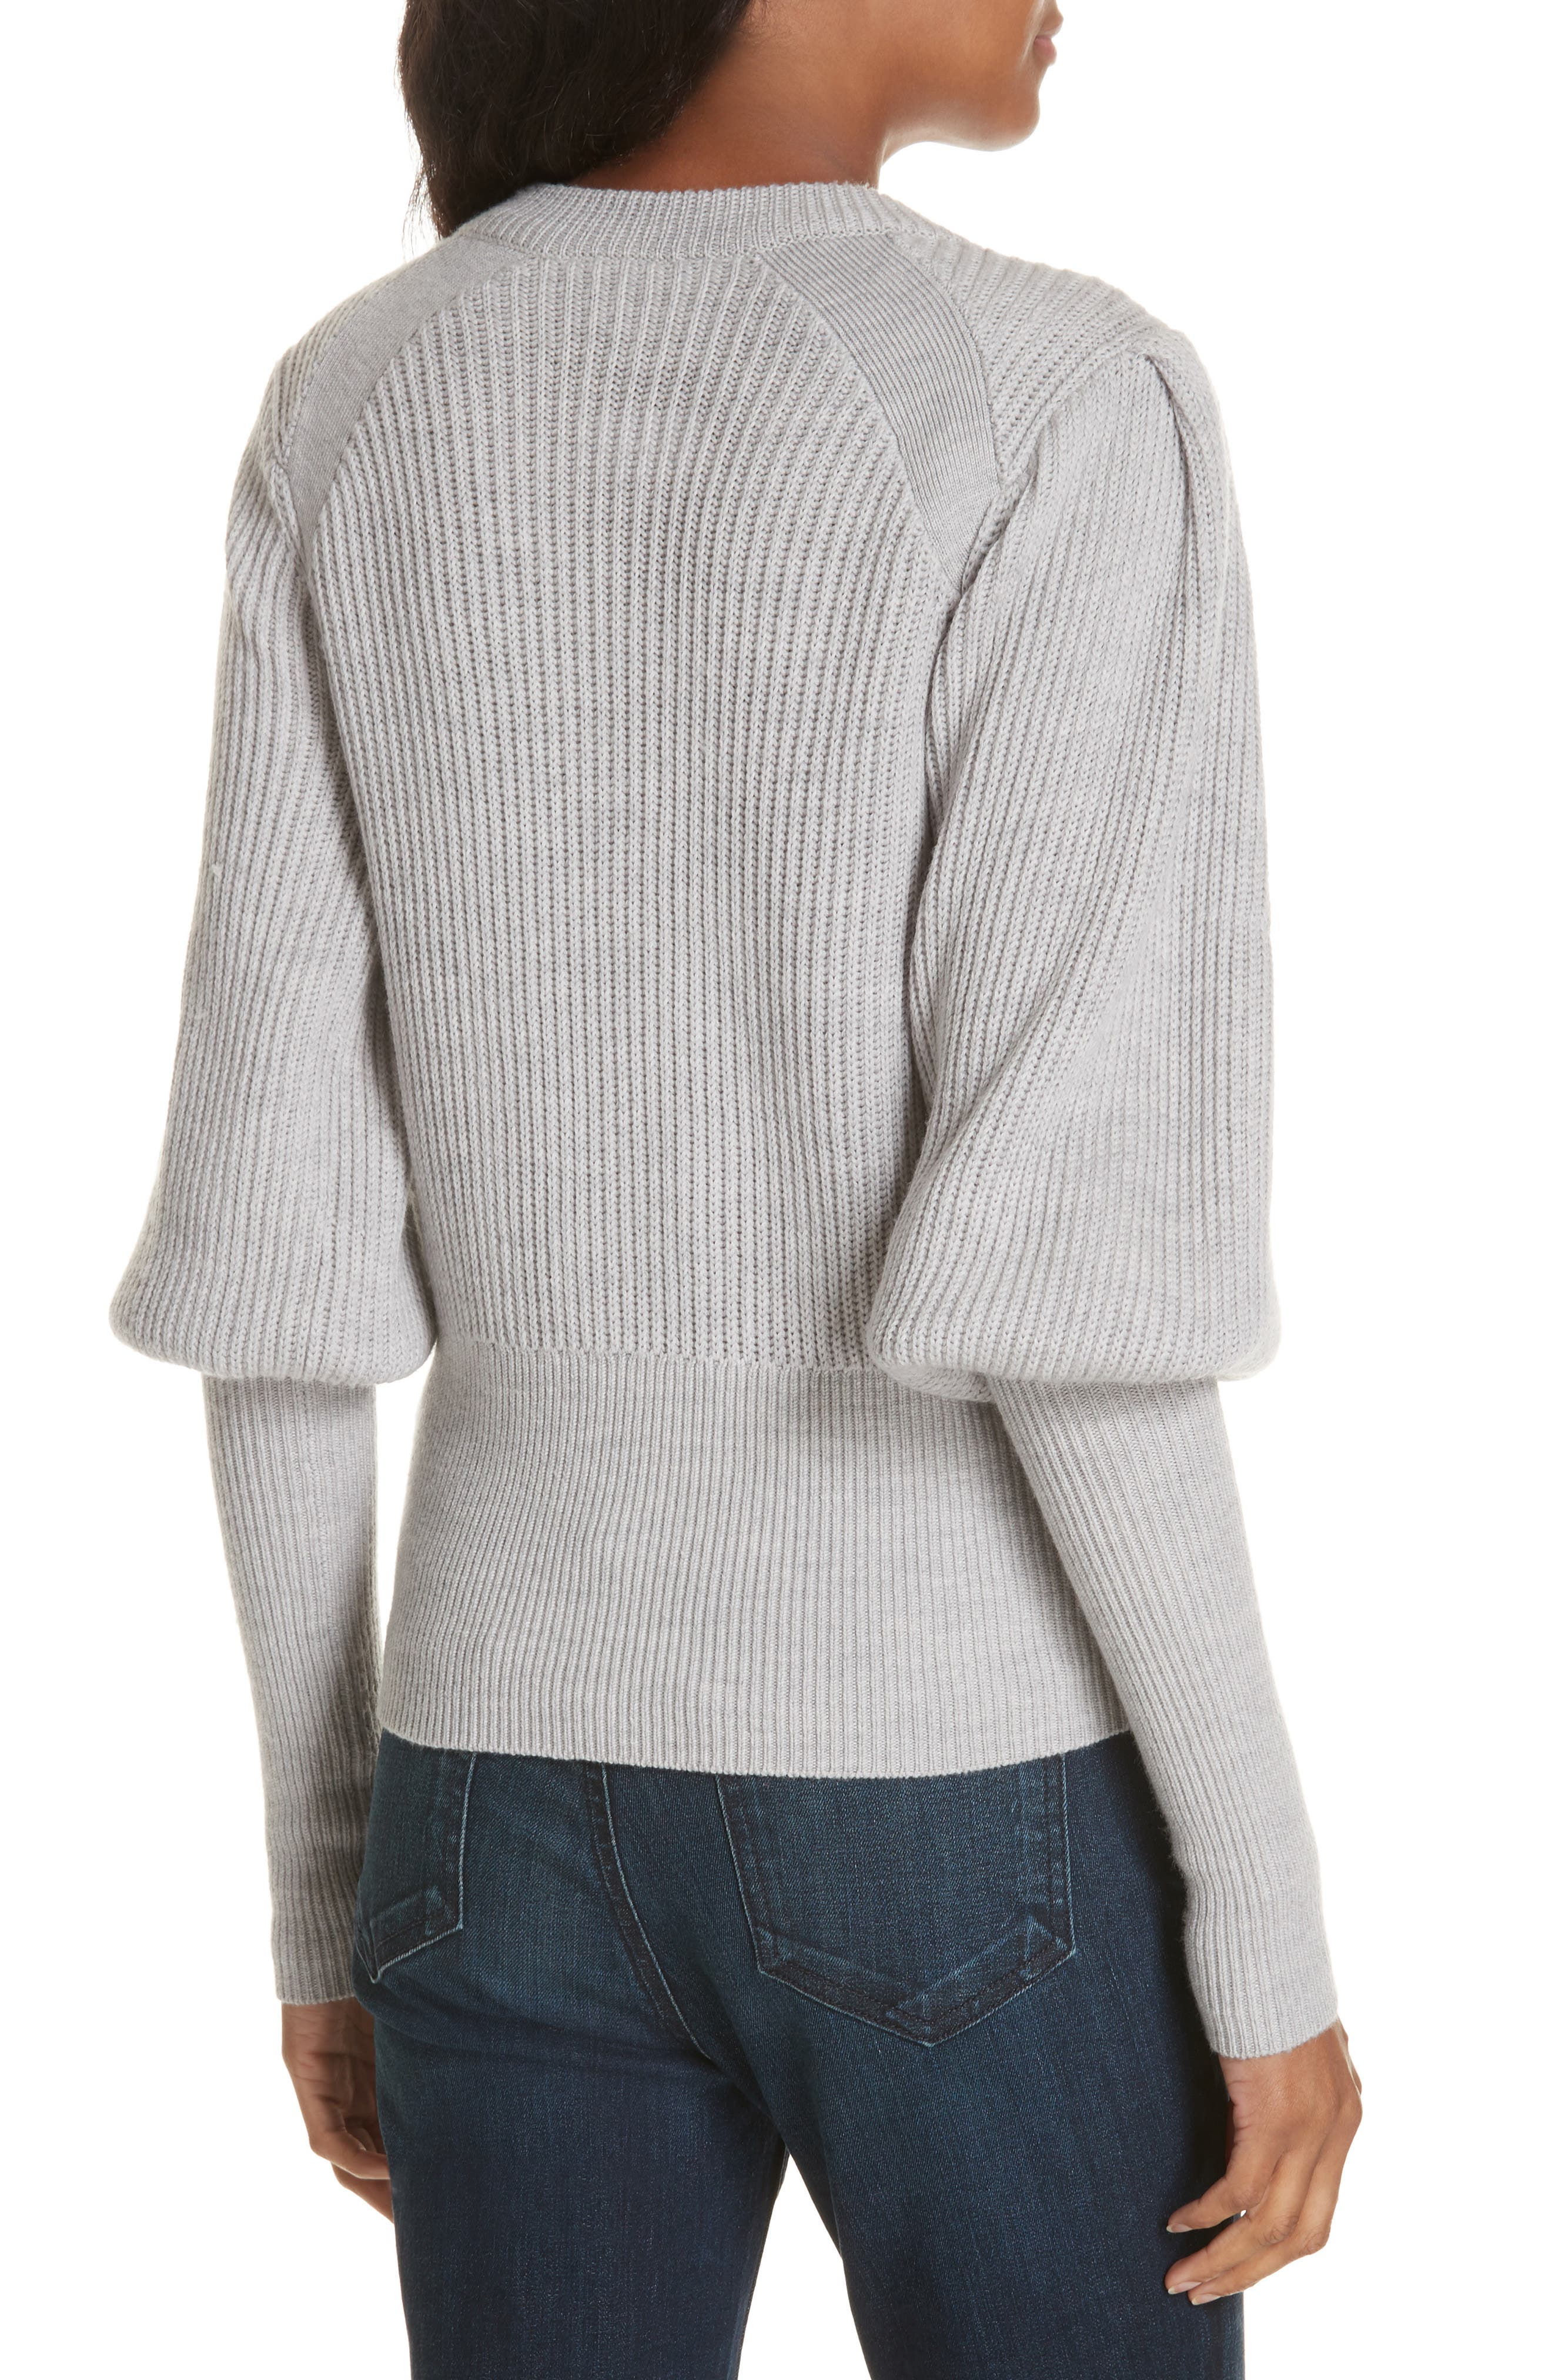 Veronica Beard Jude Crystal Button Merino Wool Sweater